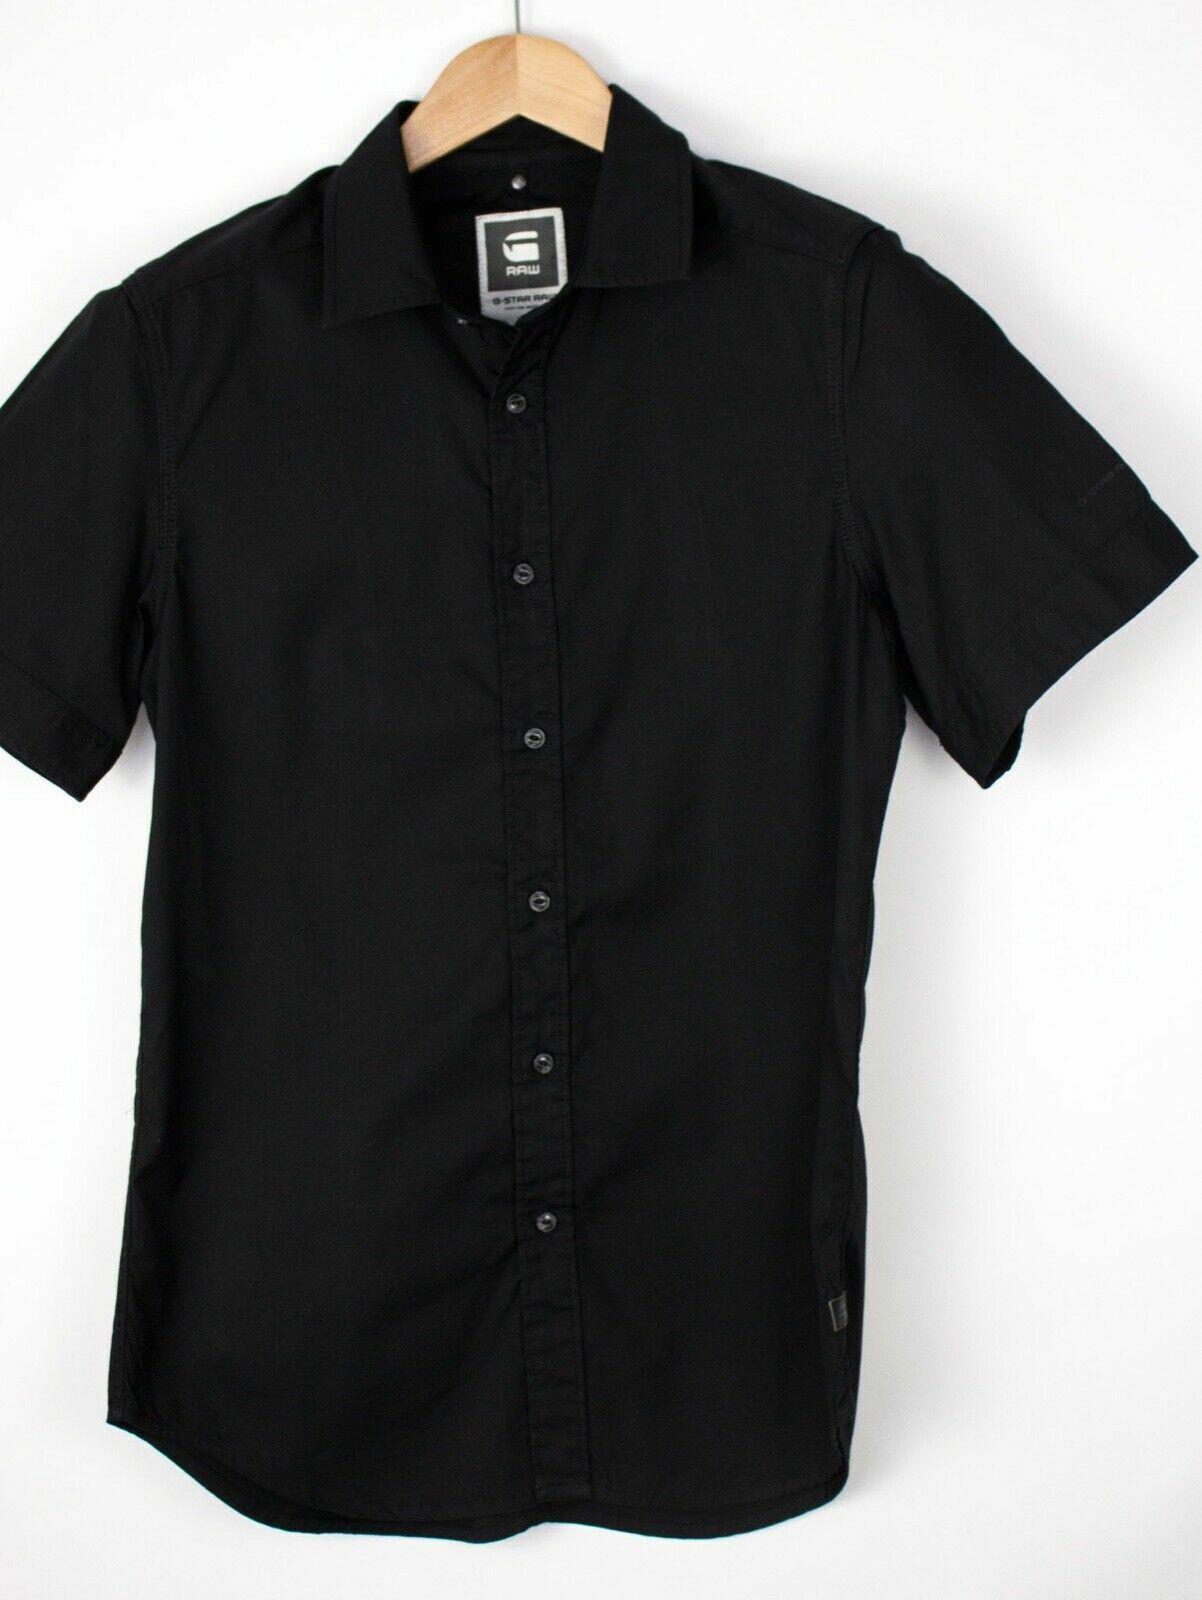 G-Star Raw Hombres Landon Informal Camisa Tamaño M